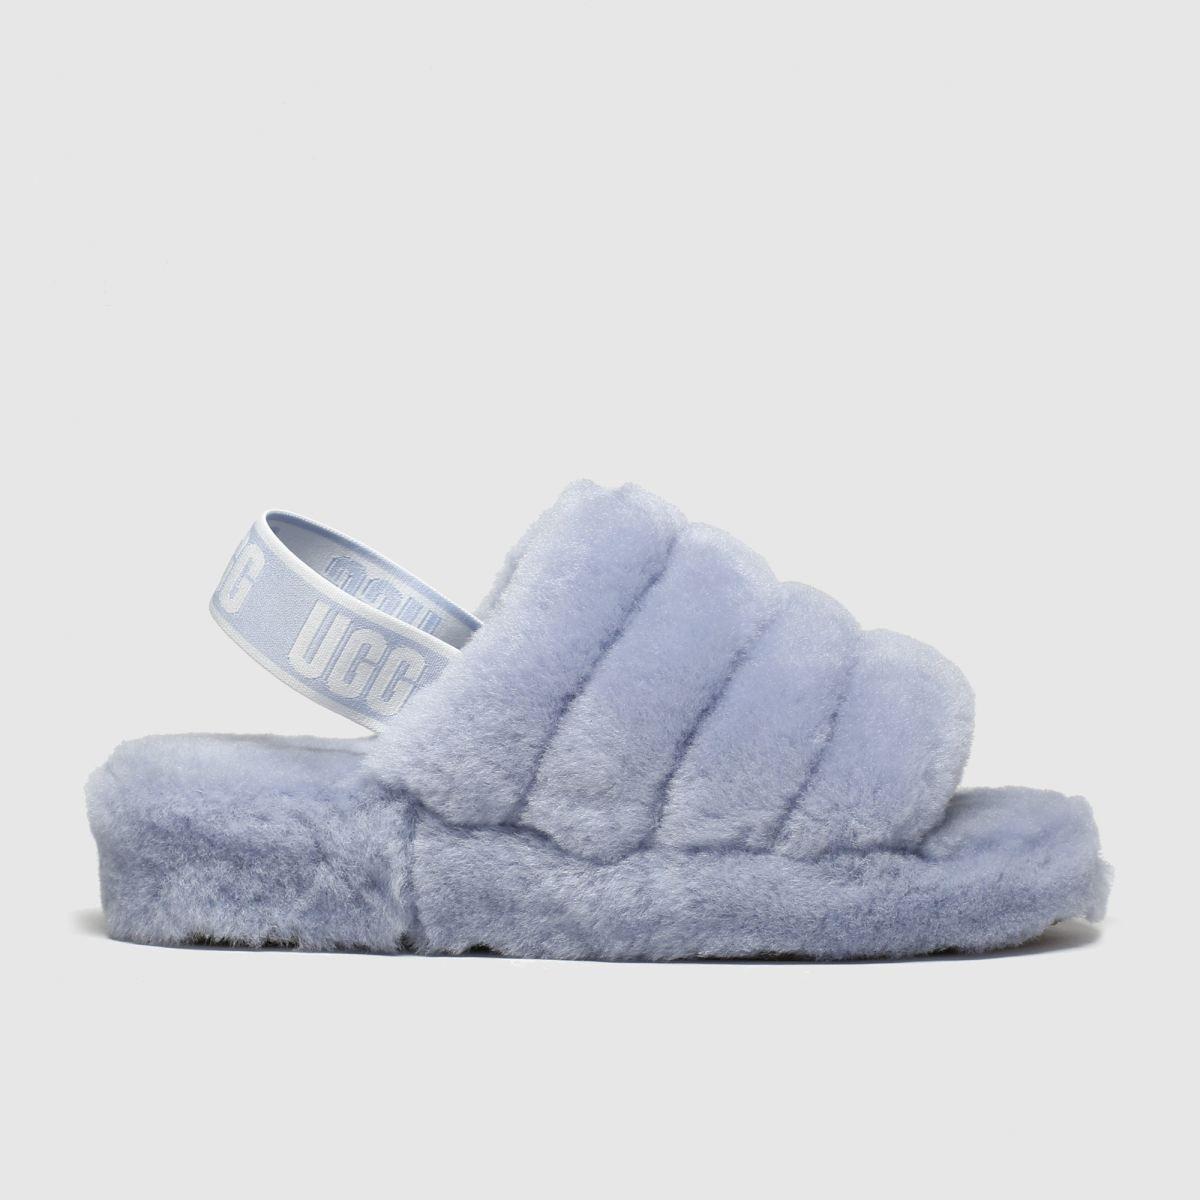 Ugg Pale Blue Fluff Yeah Slide Slippers